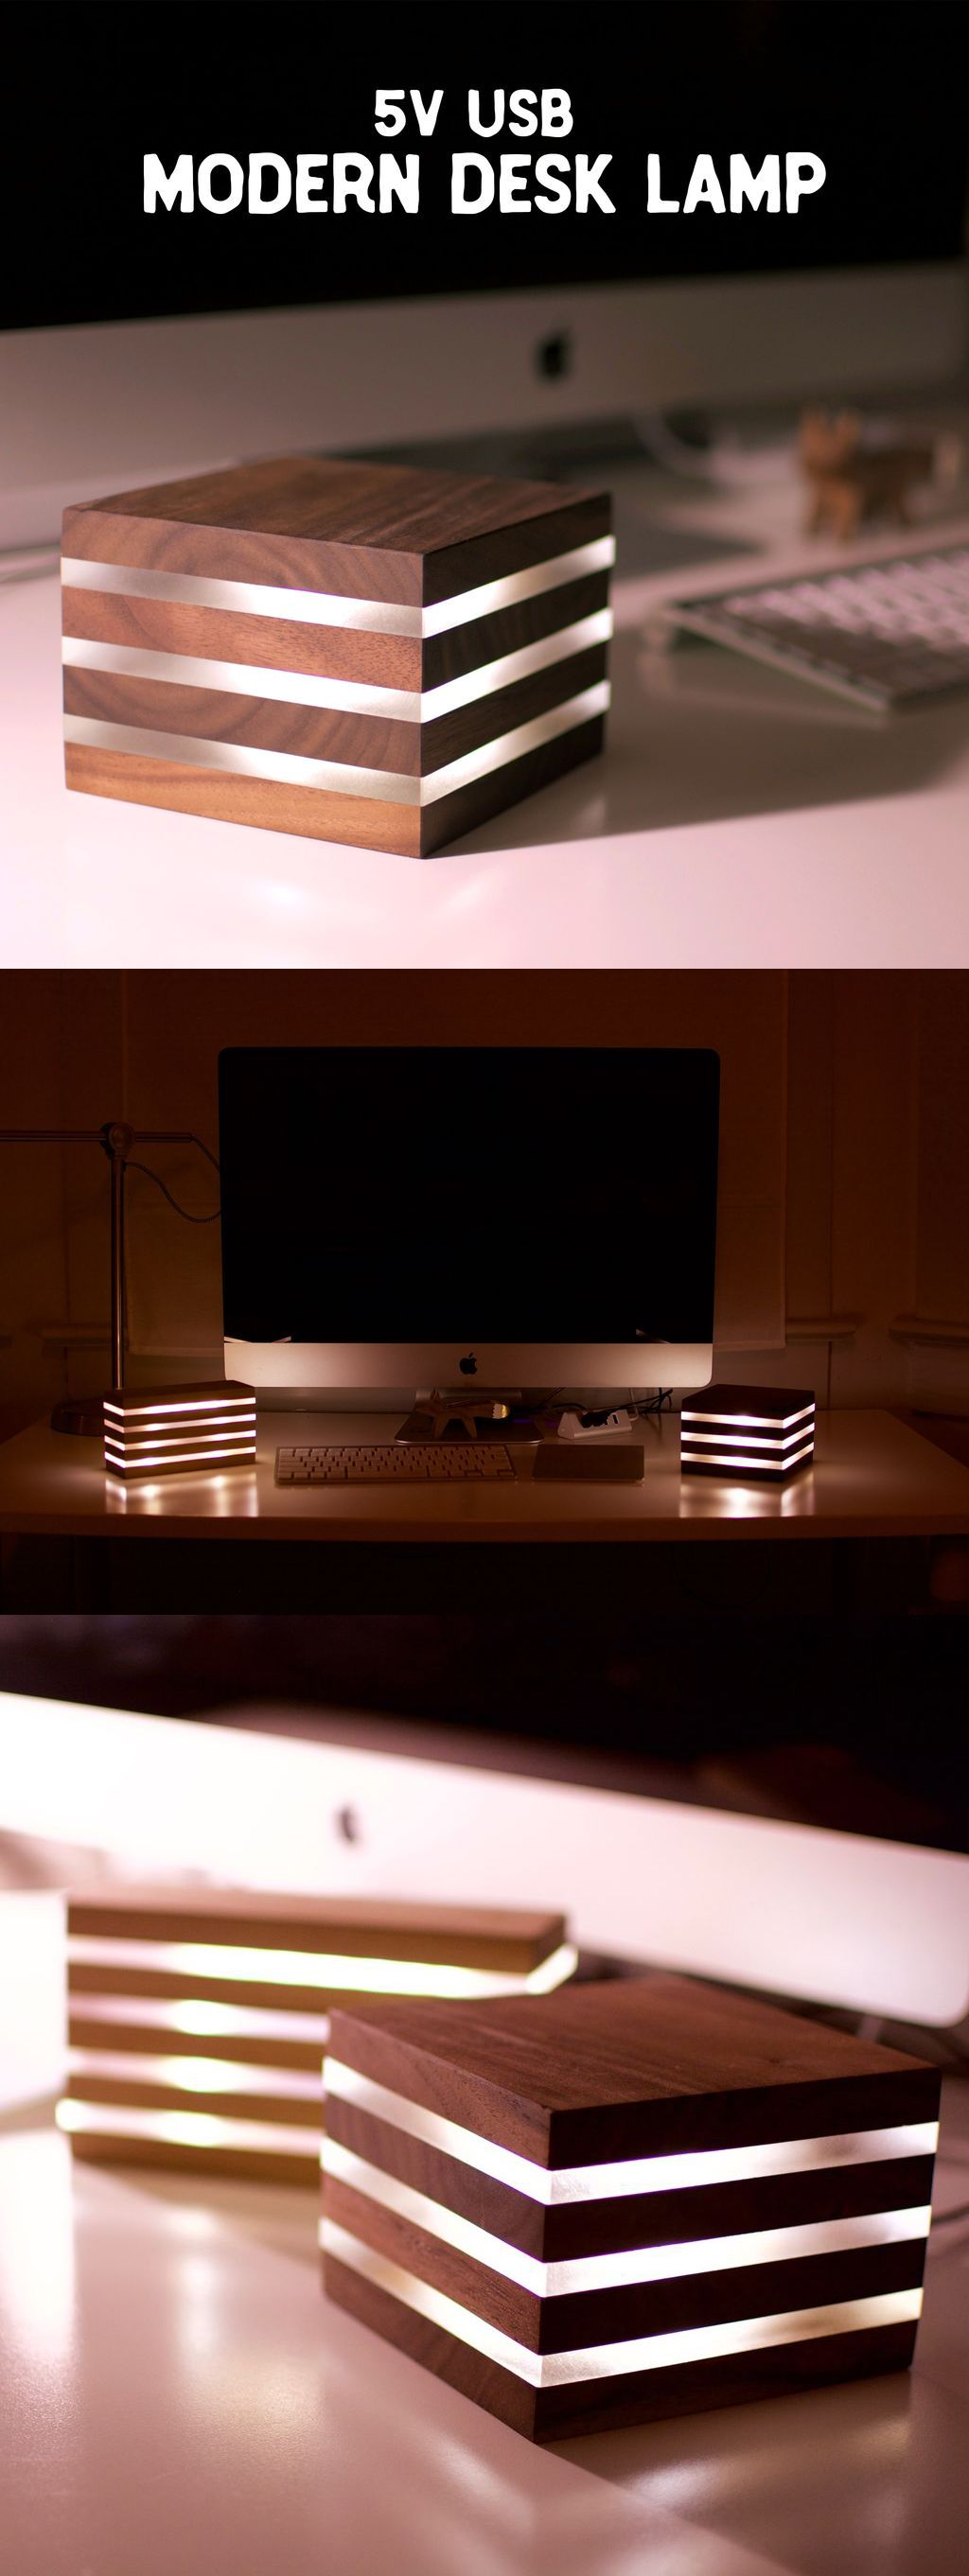 Modern Led Desk Lamp Powered By 5v Usb Wood Pixodium